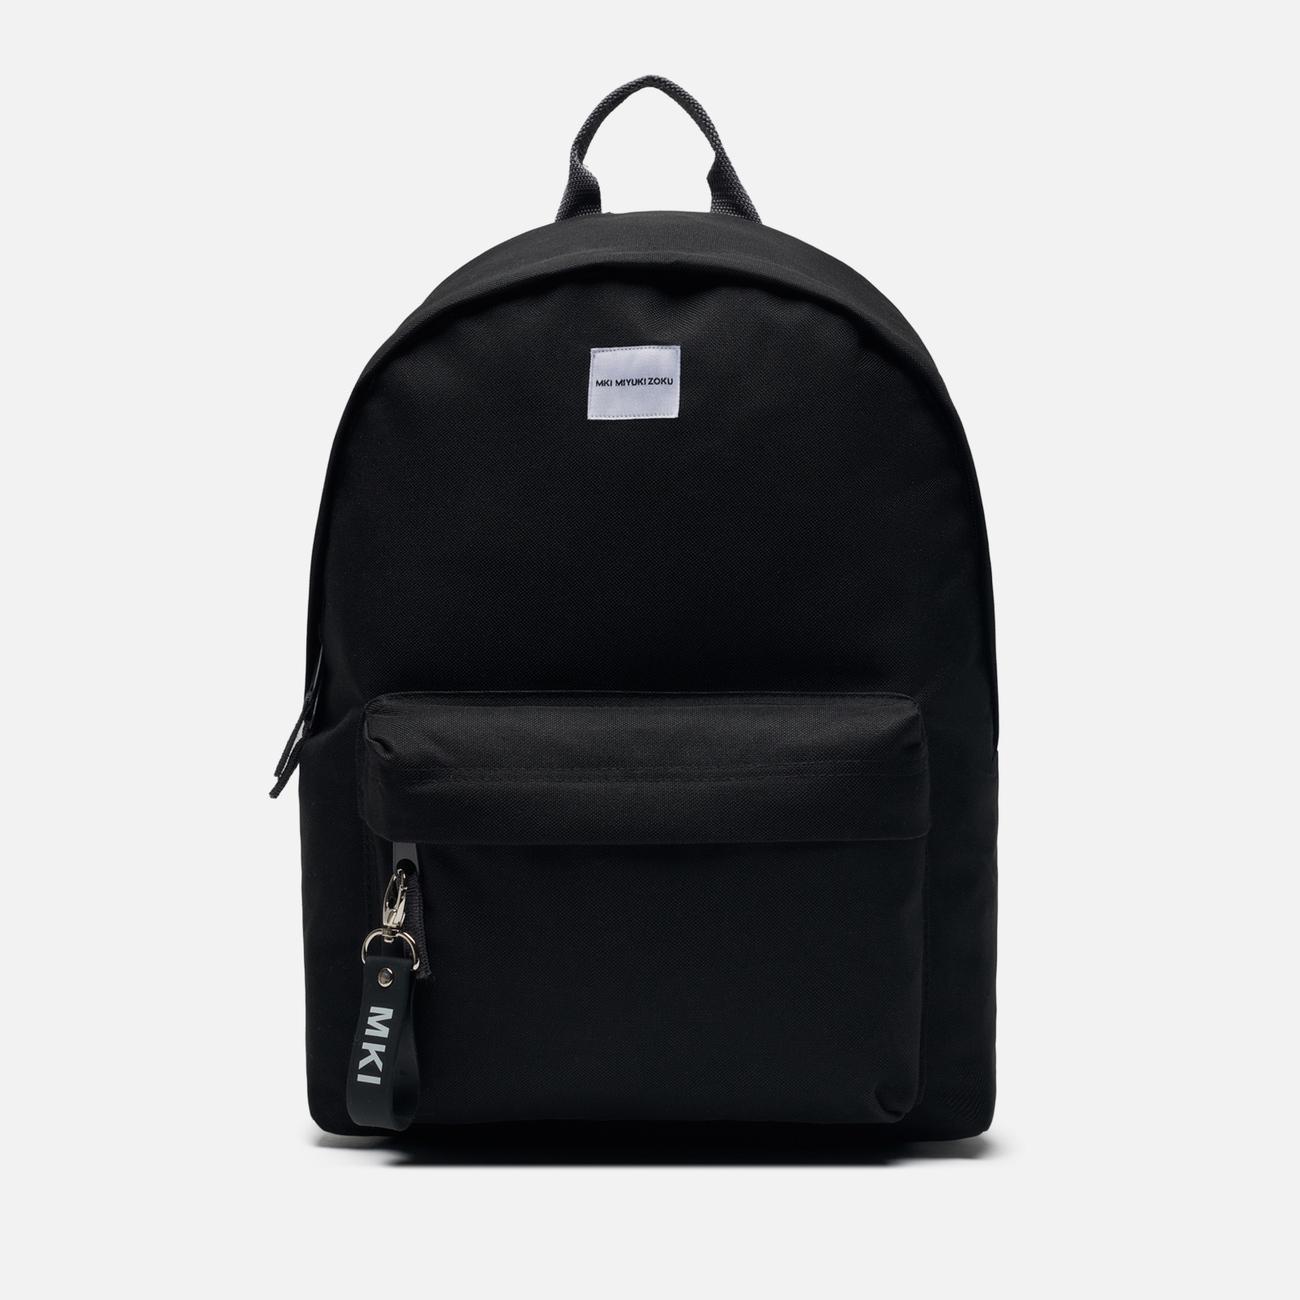 Рюкзак MKI Miyuki-Zoku 600 Daypack 30L Black